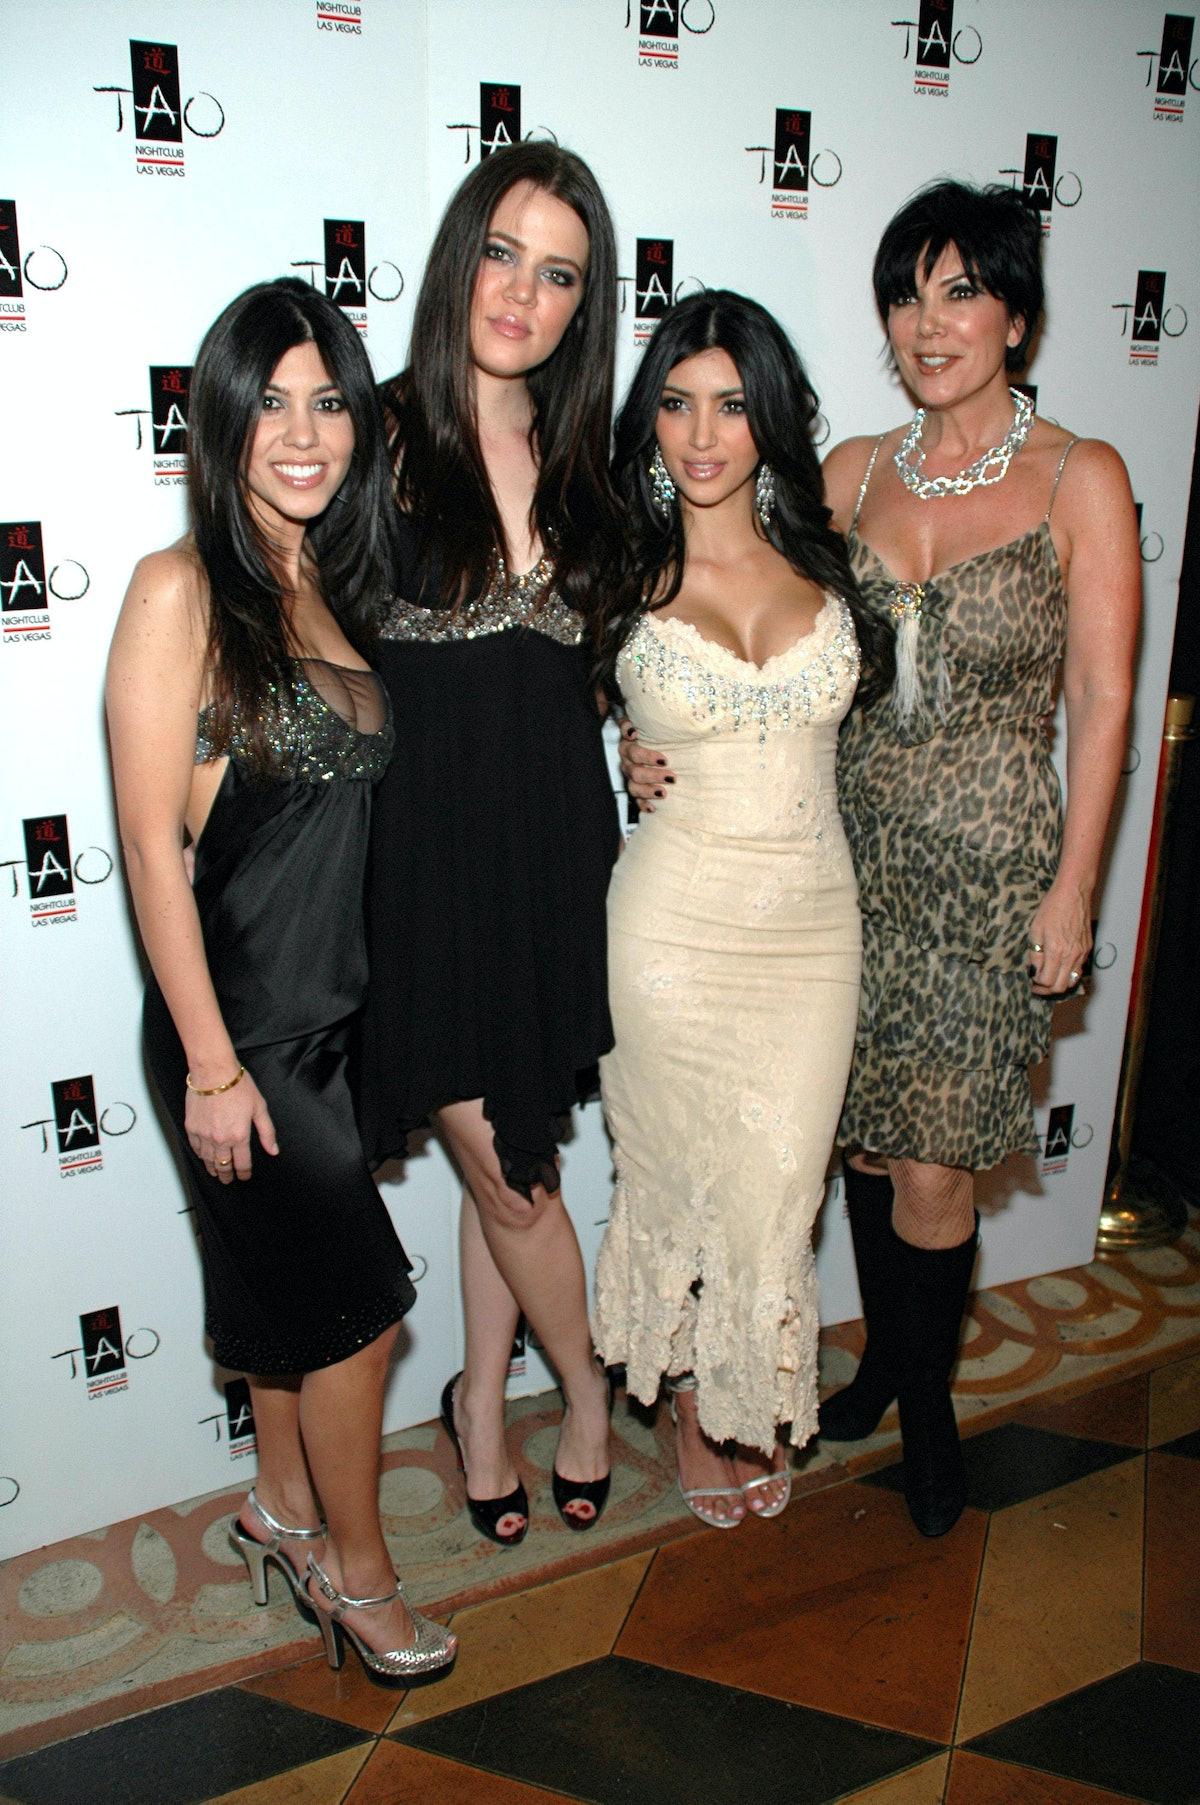 The Kardashians in earlier years.